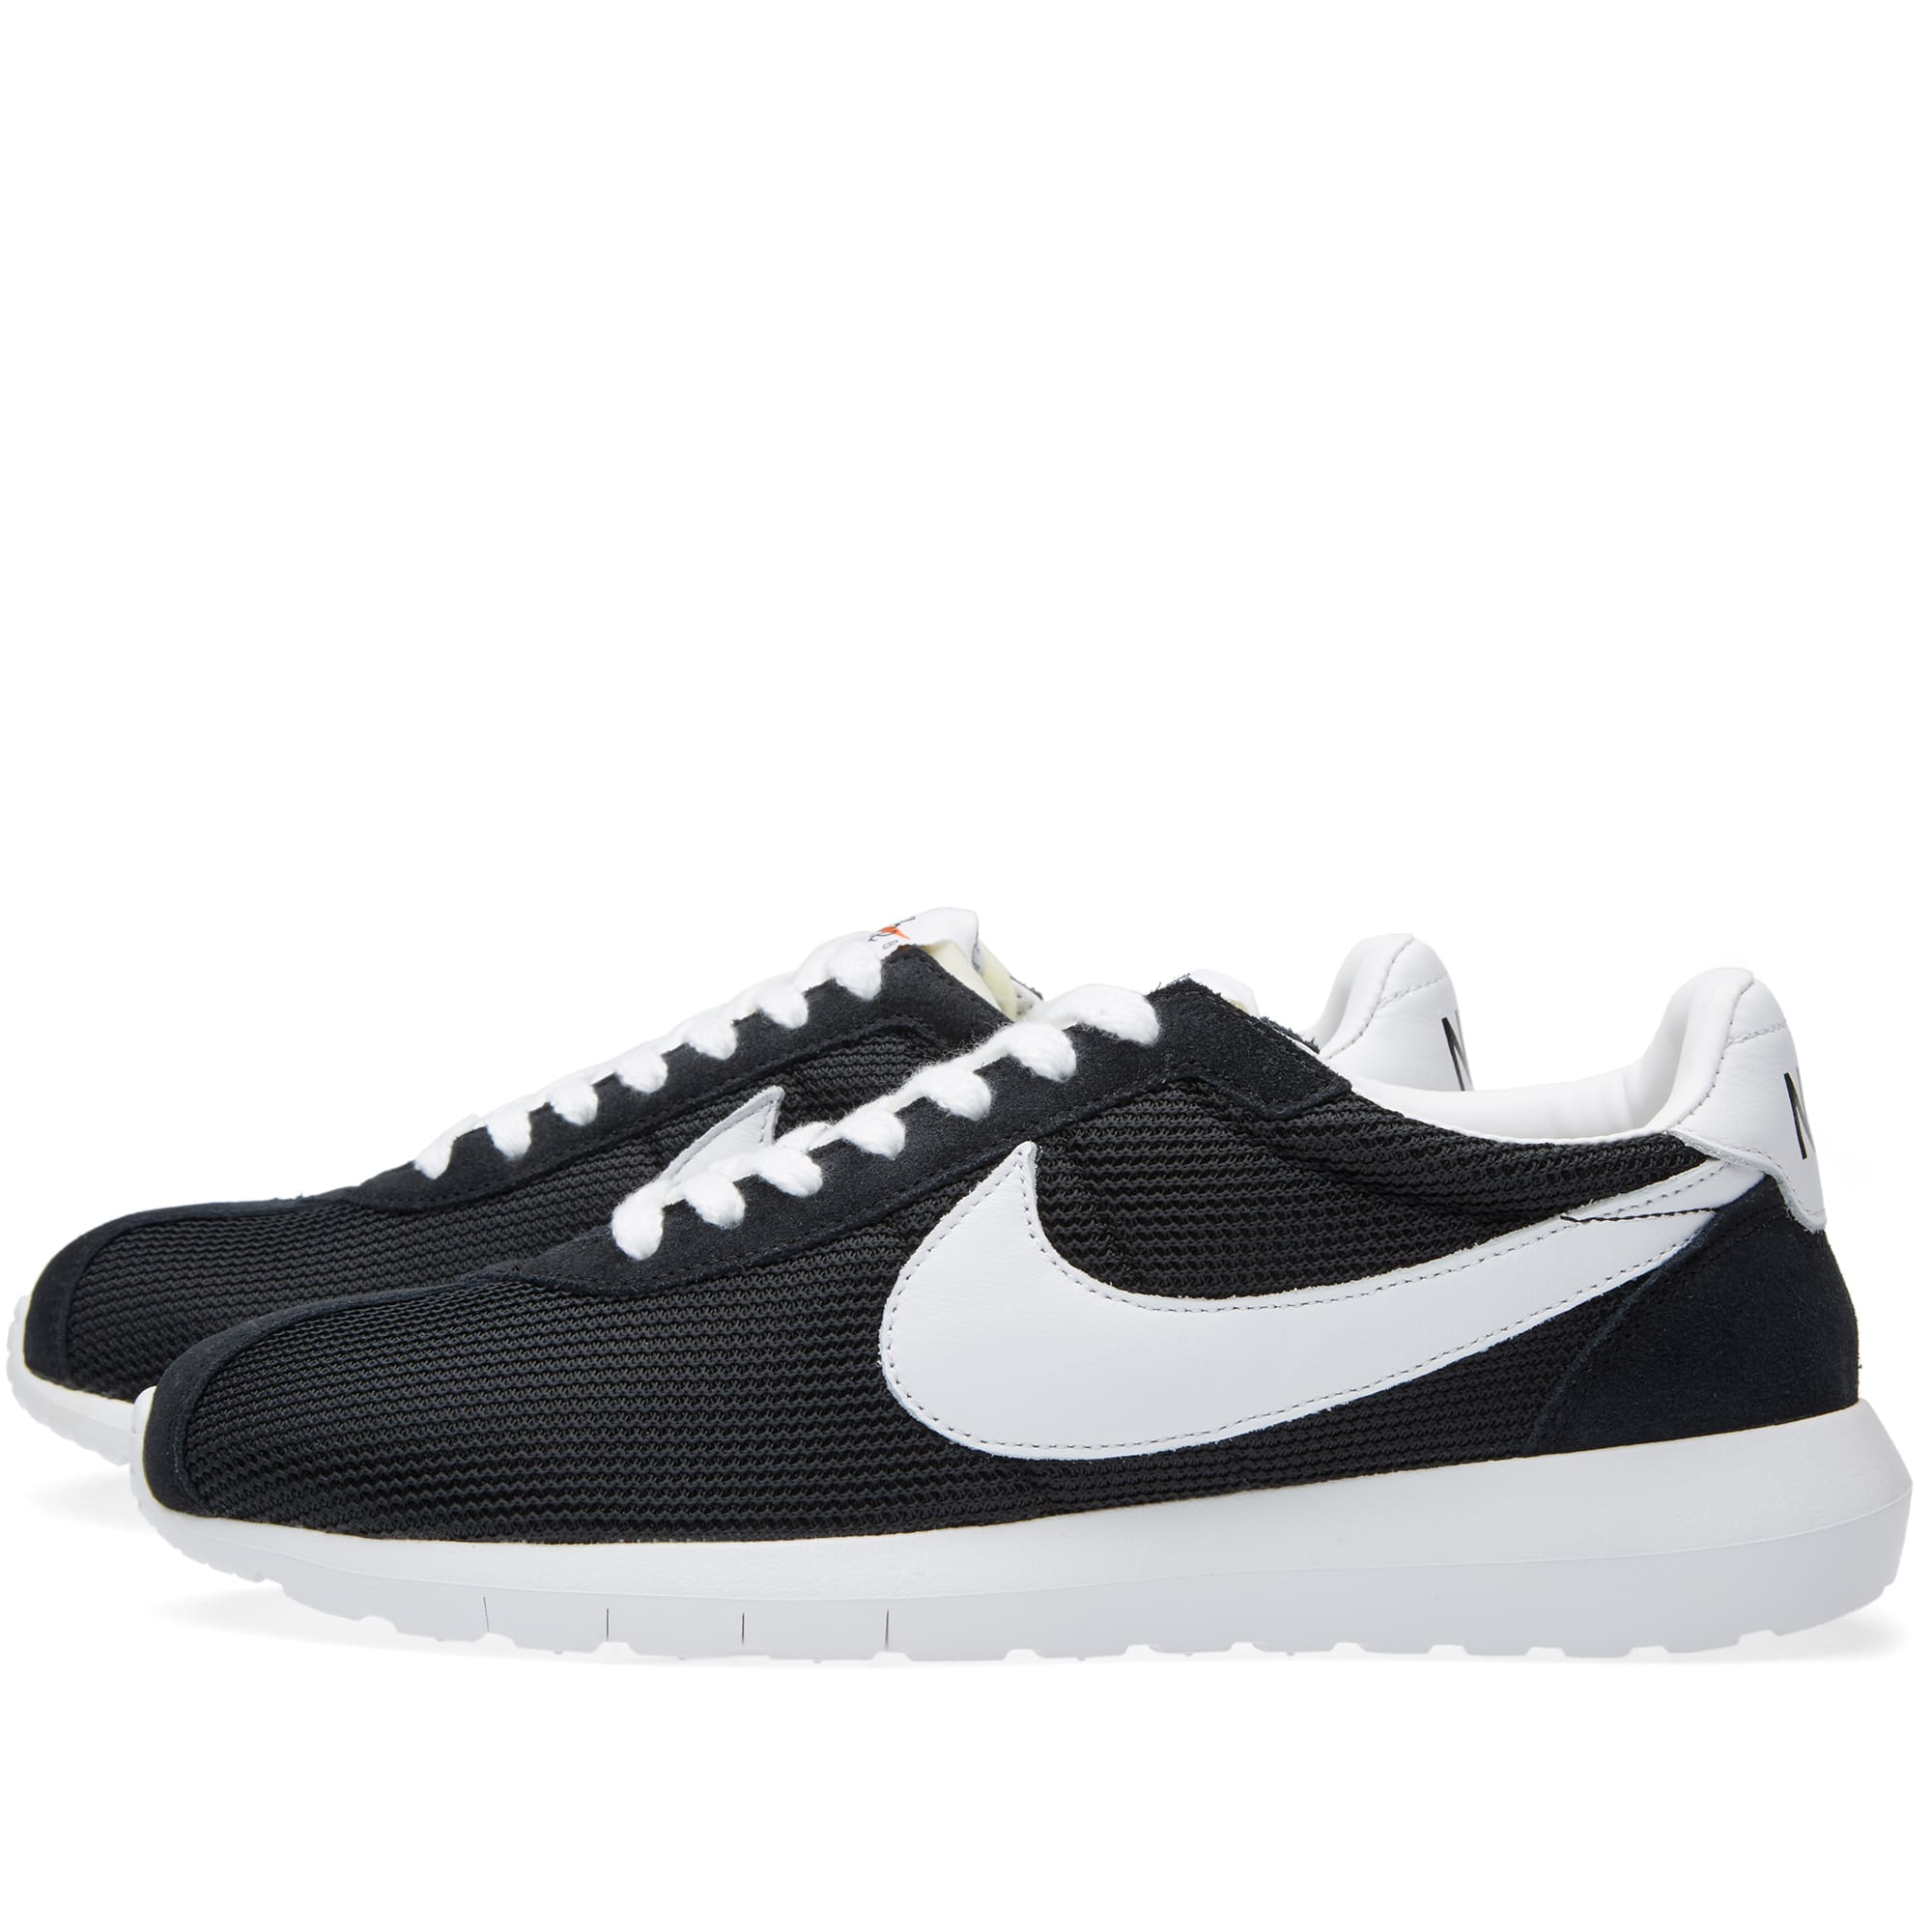 promo code 6ac4a 5f3e6 Nike Roshe LD-1000 QS Black   White   END.